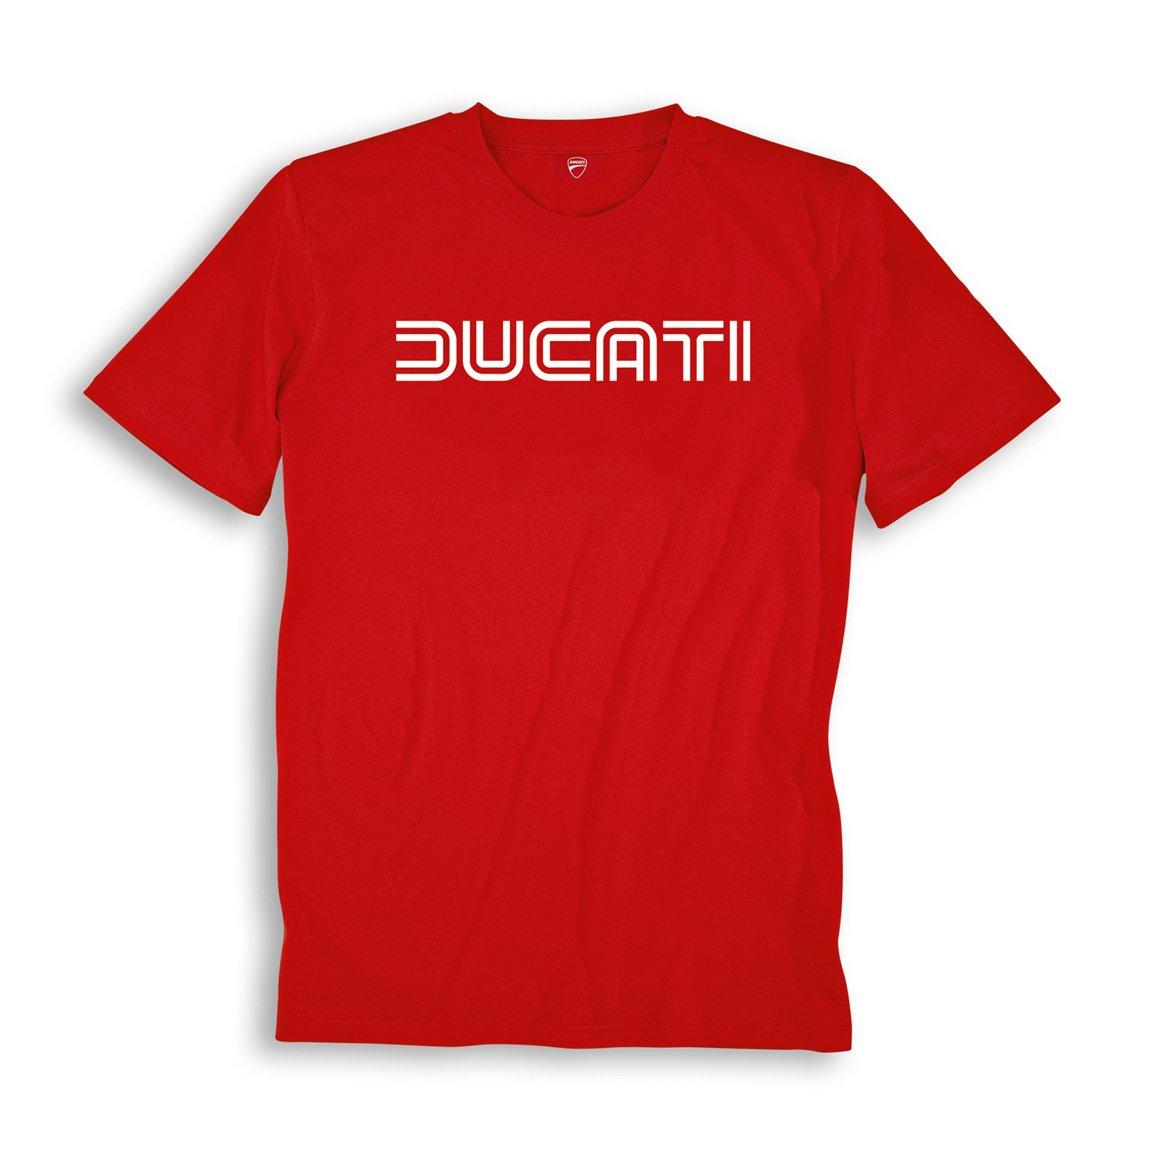 Ducati Ducatiana 80's Eighties Short Sleeve T-Shirt Red XX-Large